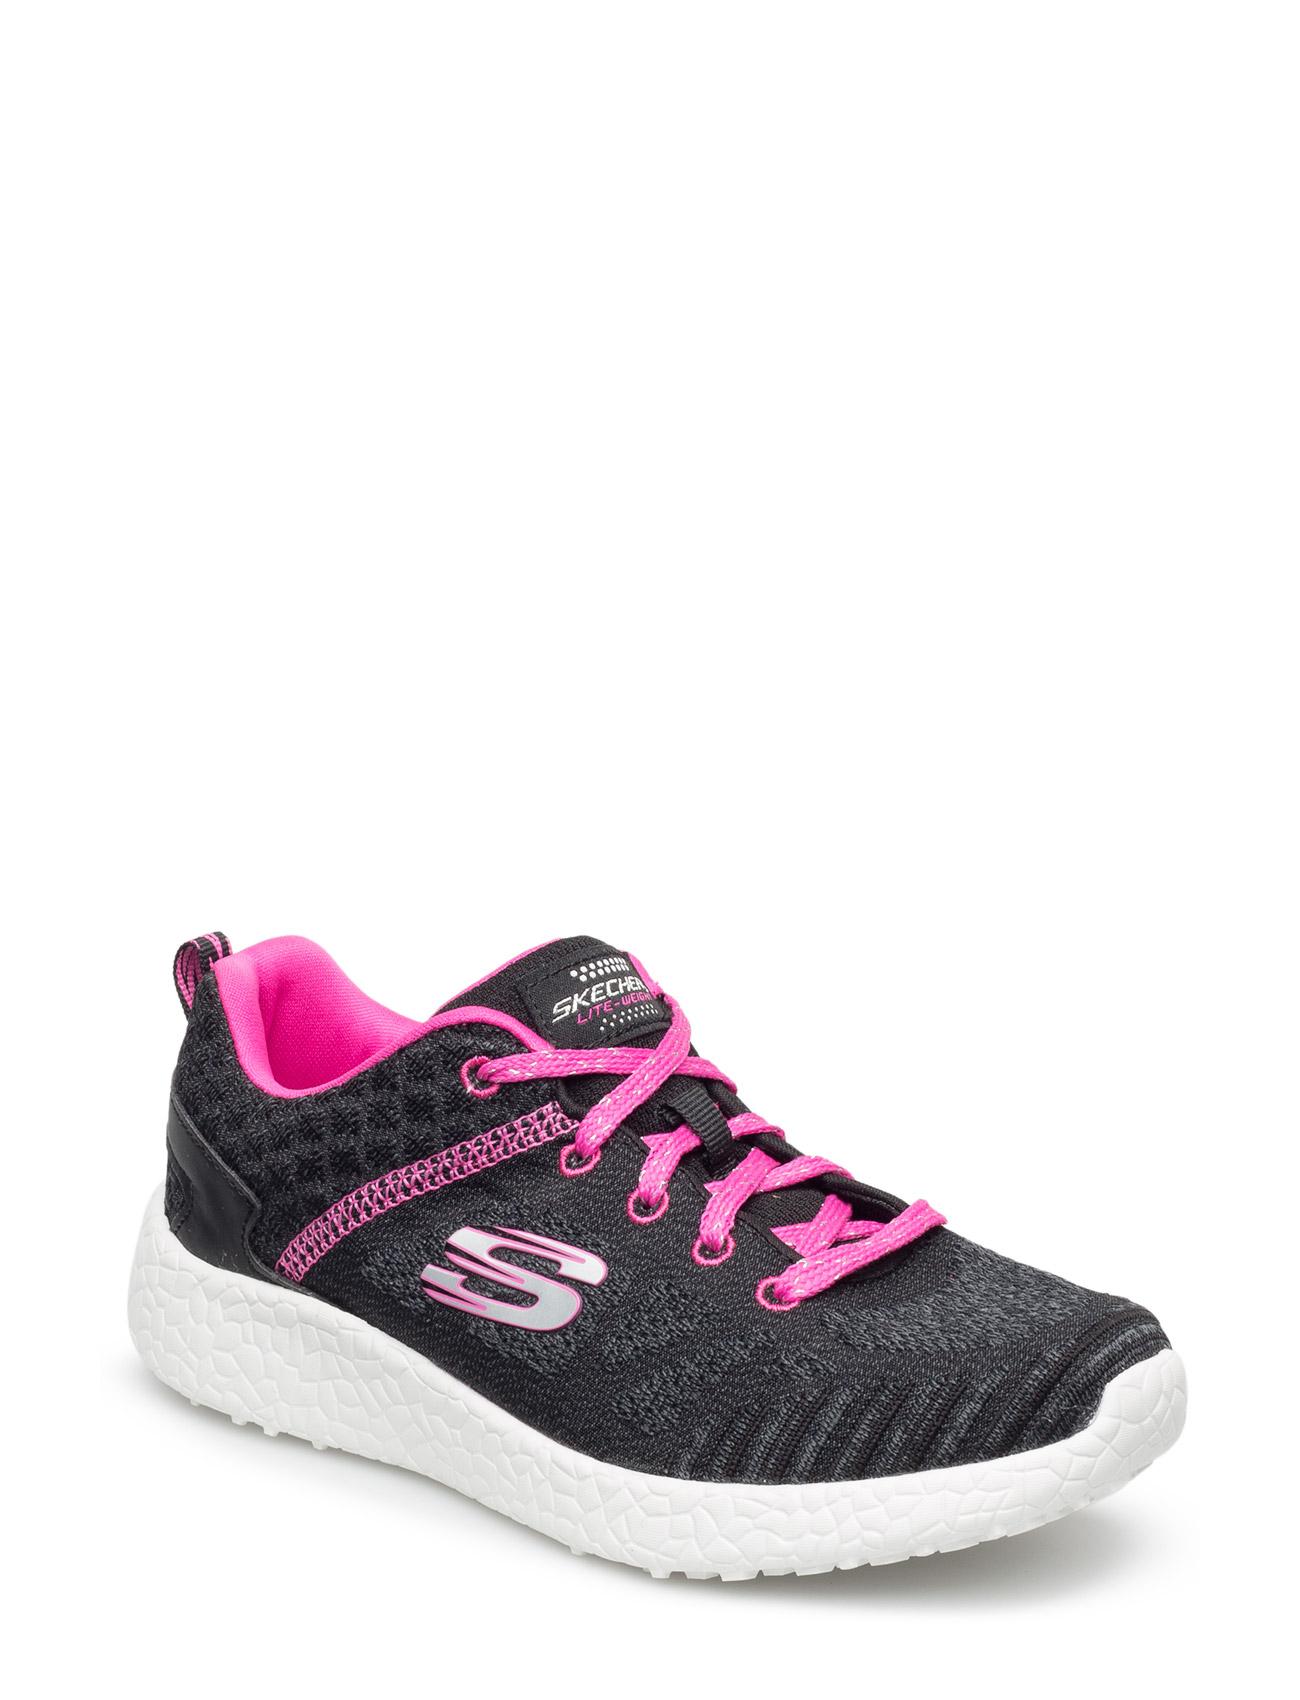 Skechers Burst Skechers Sko & Sneakers til Børn i